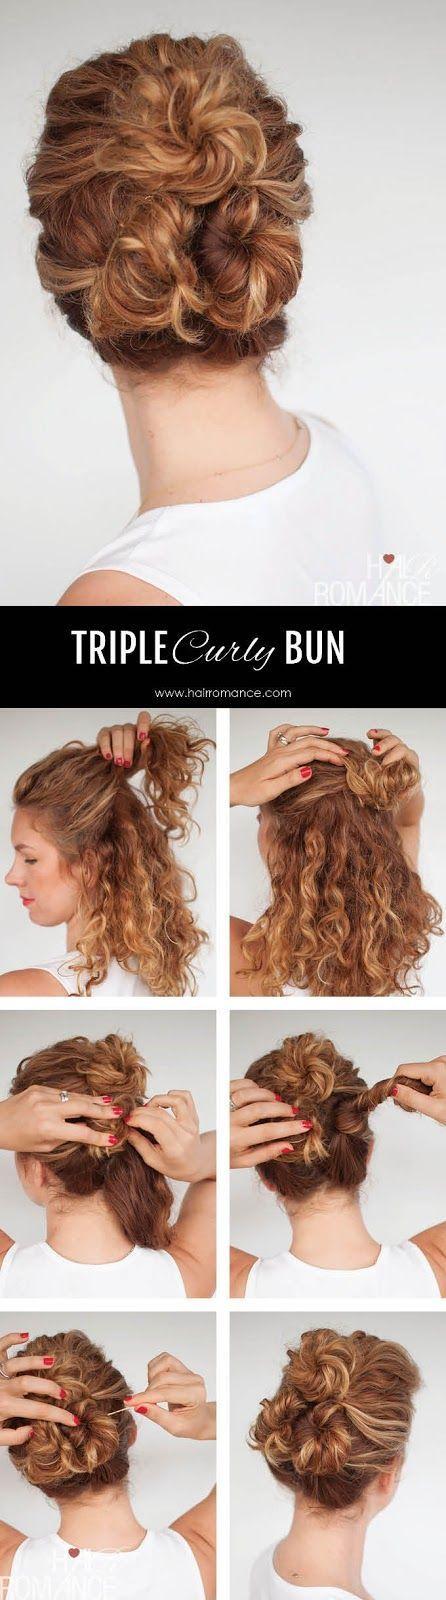 Hair-Romance-Easy-everyday-curly-hairstyle-tutorials-%E2%80%93-the-curly-triple-bun-4.jpg (446×1600)